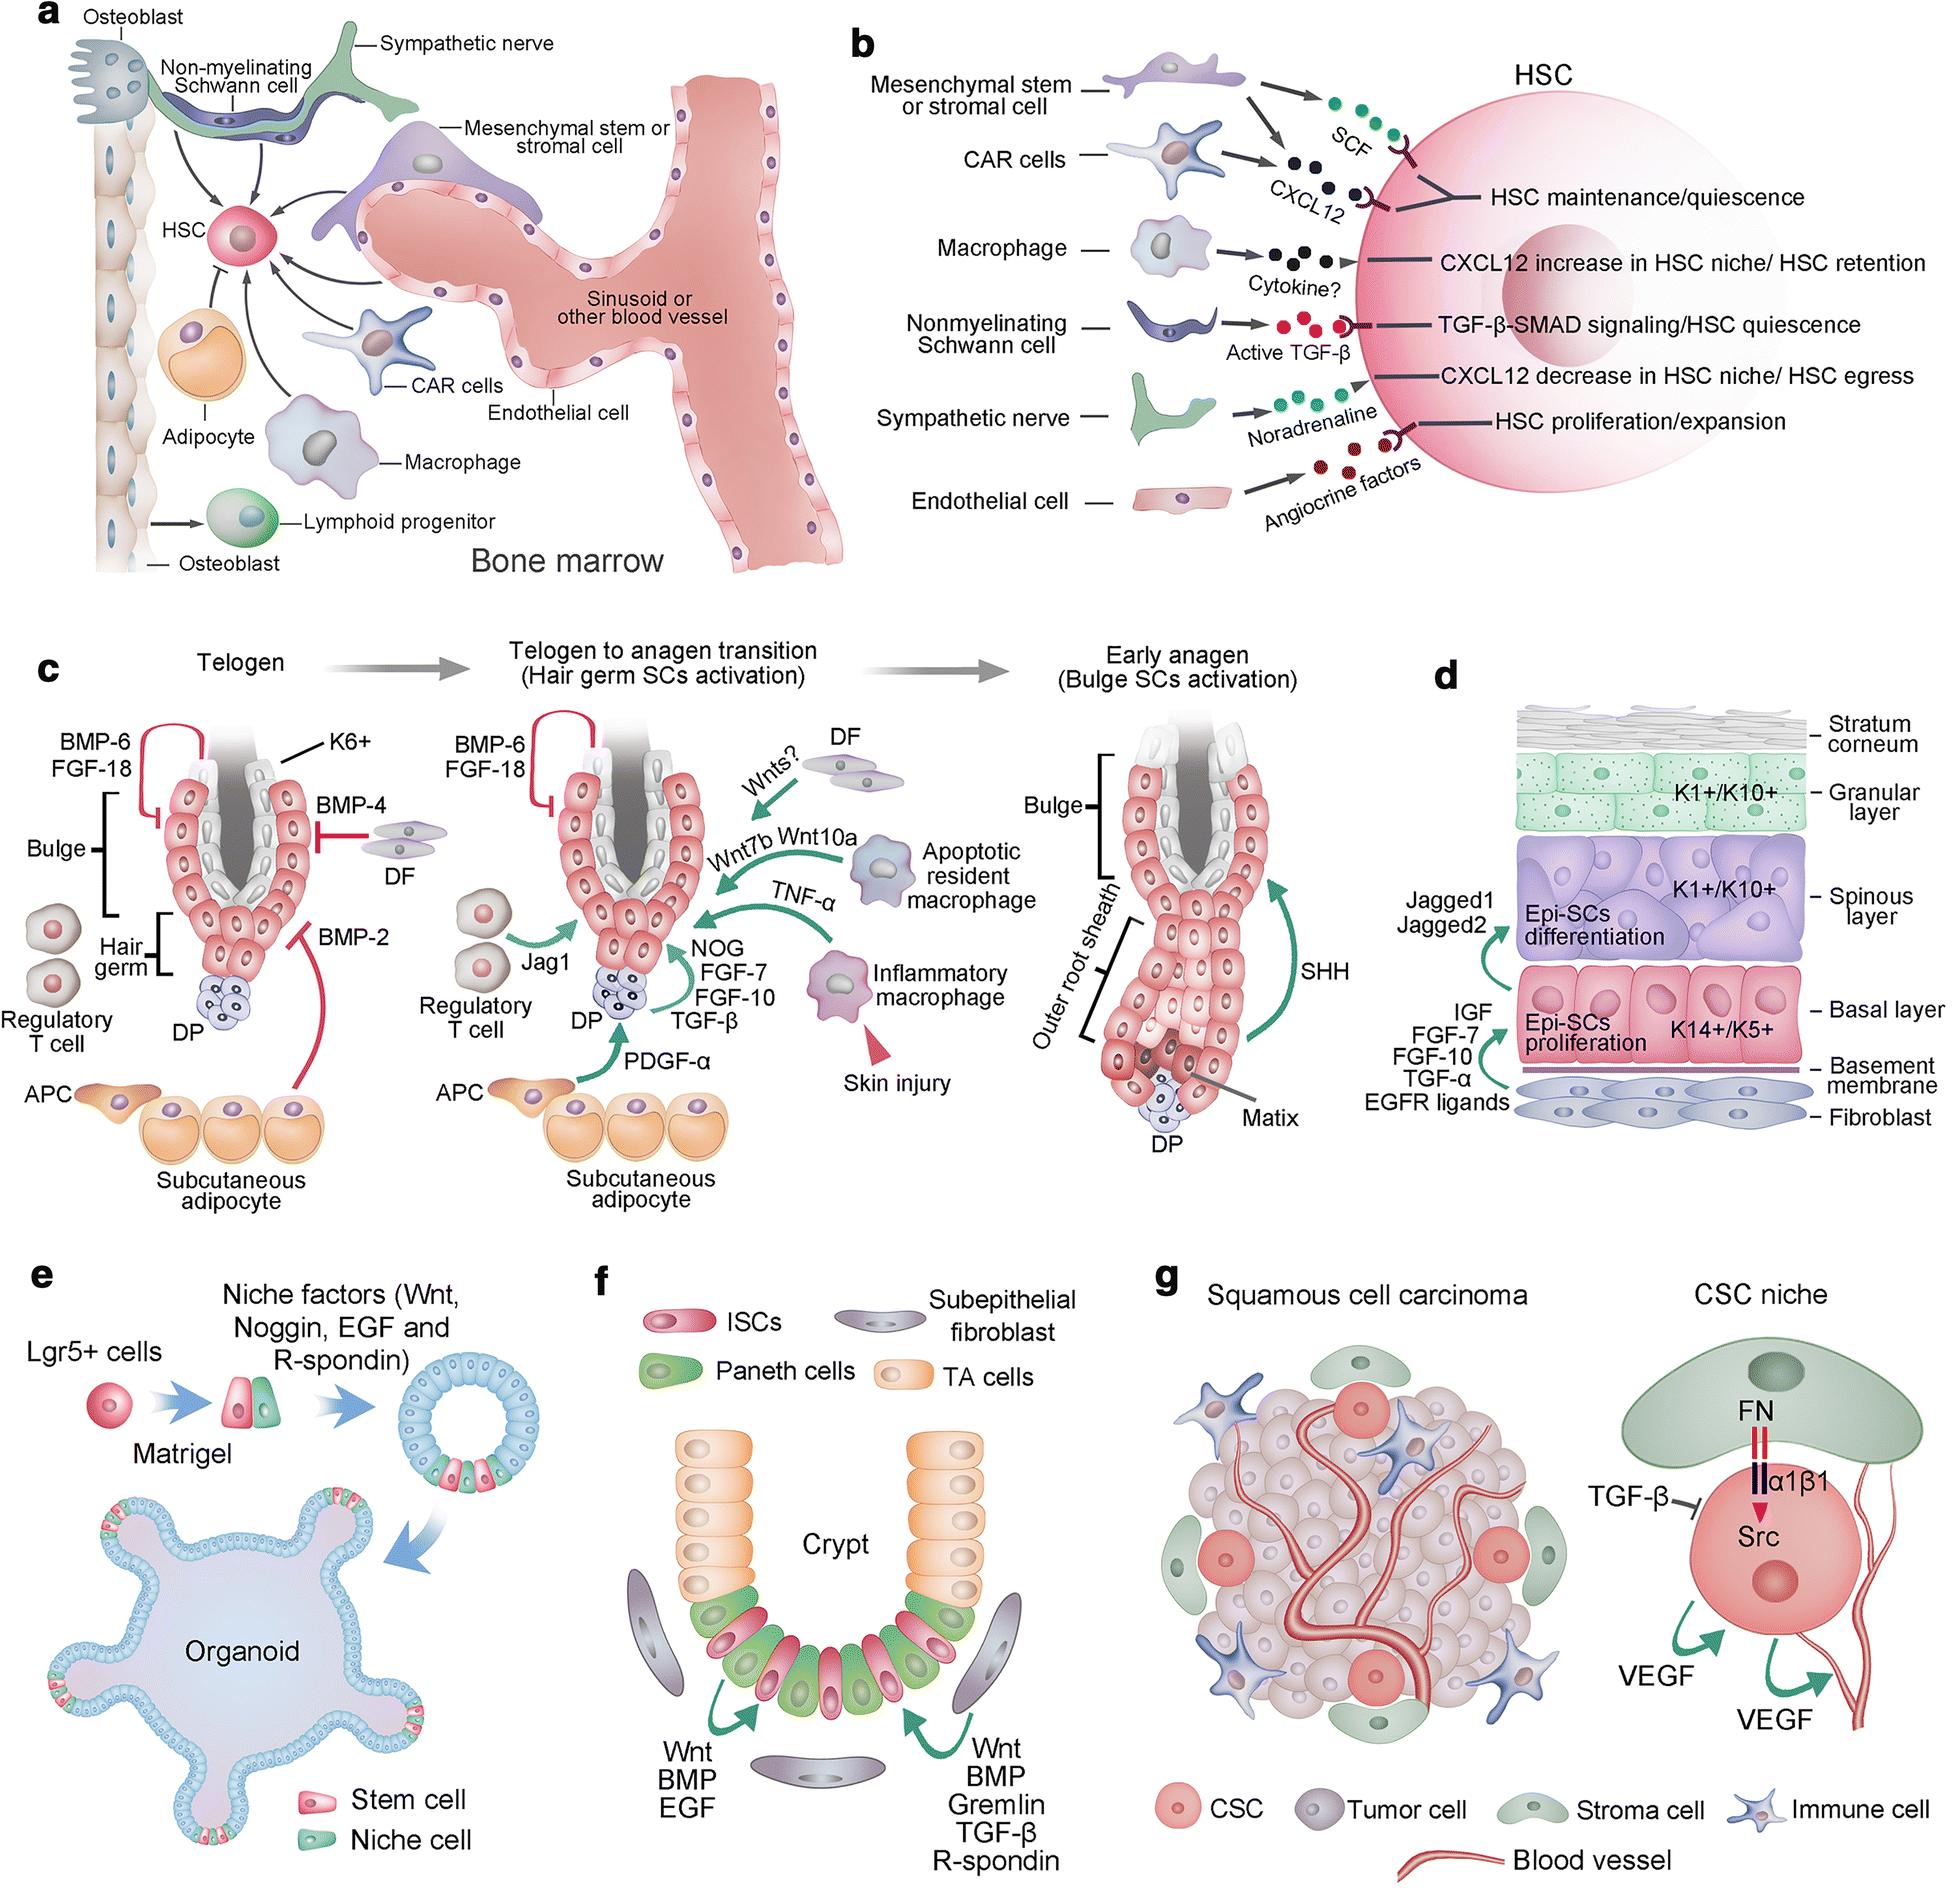 Stem cells in tissues, organoids, and cancers | SpringerLink